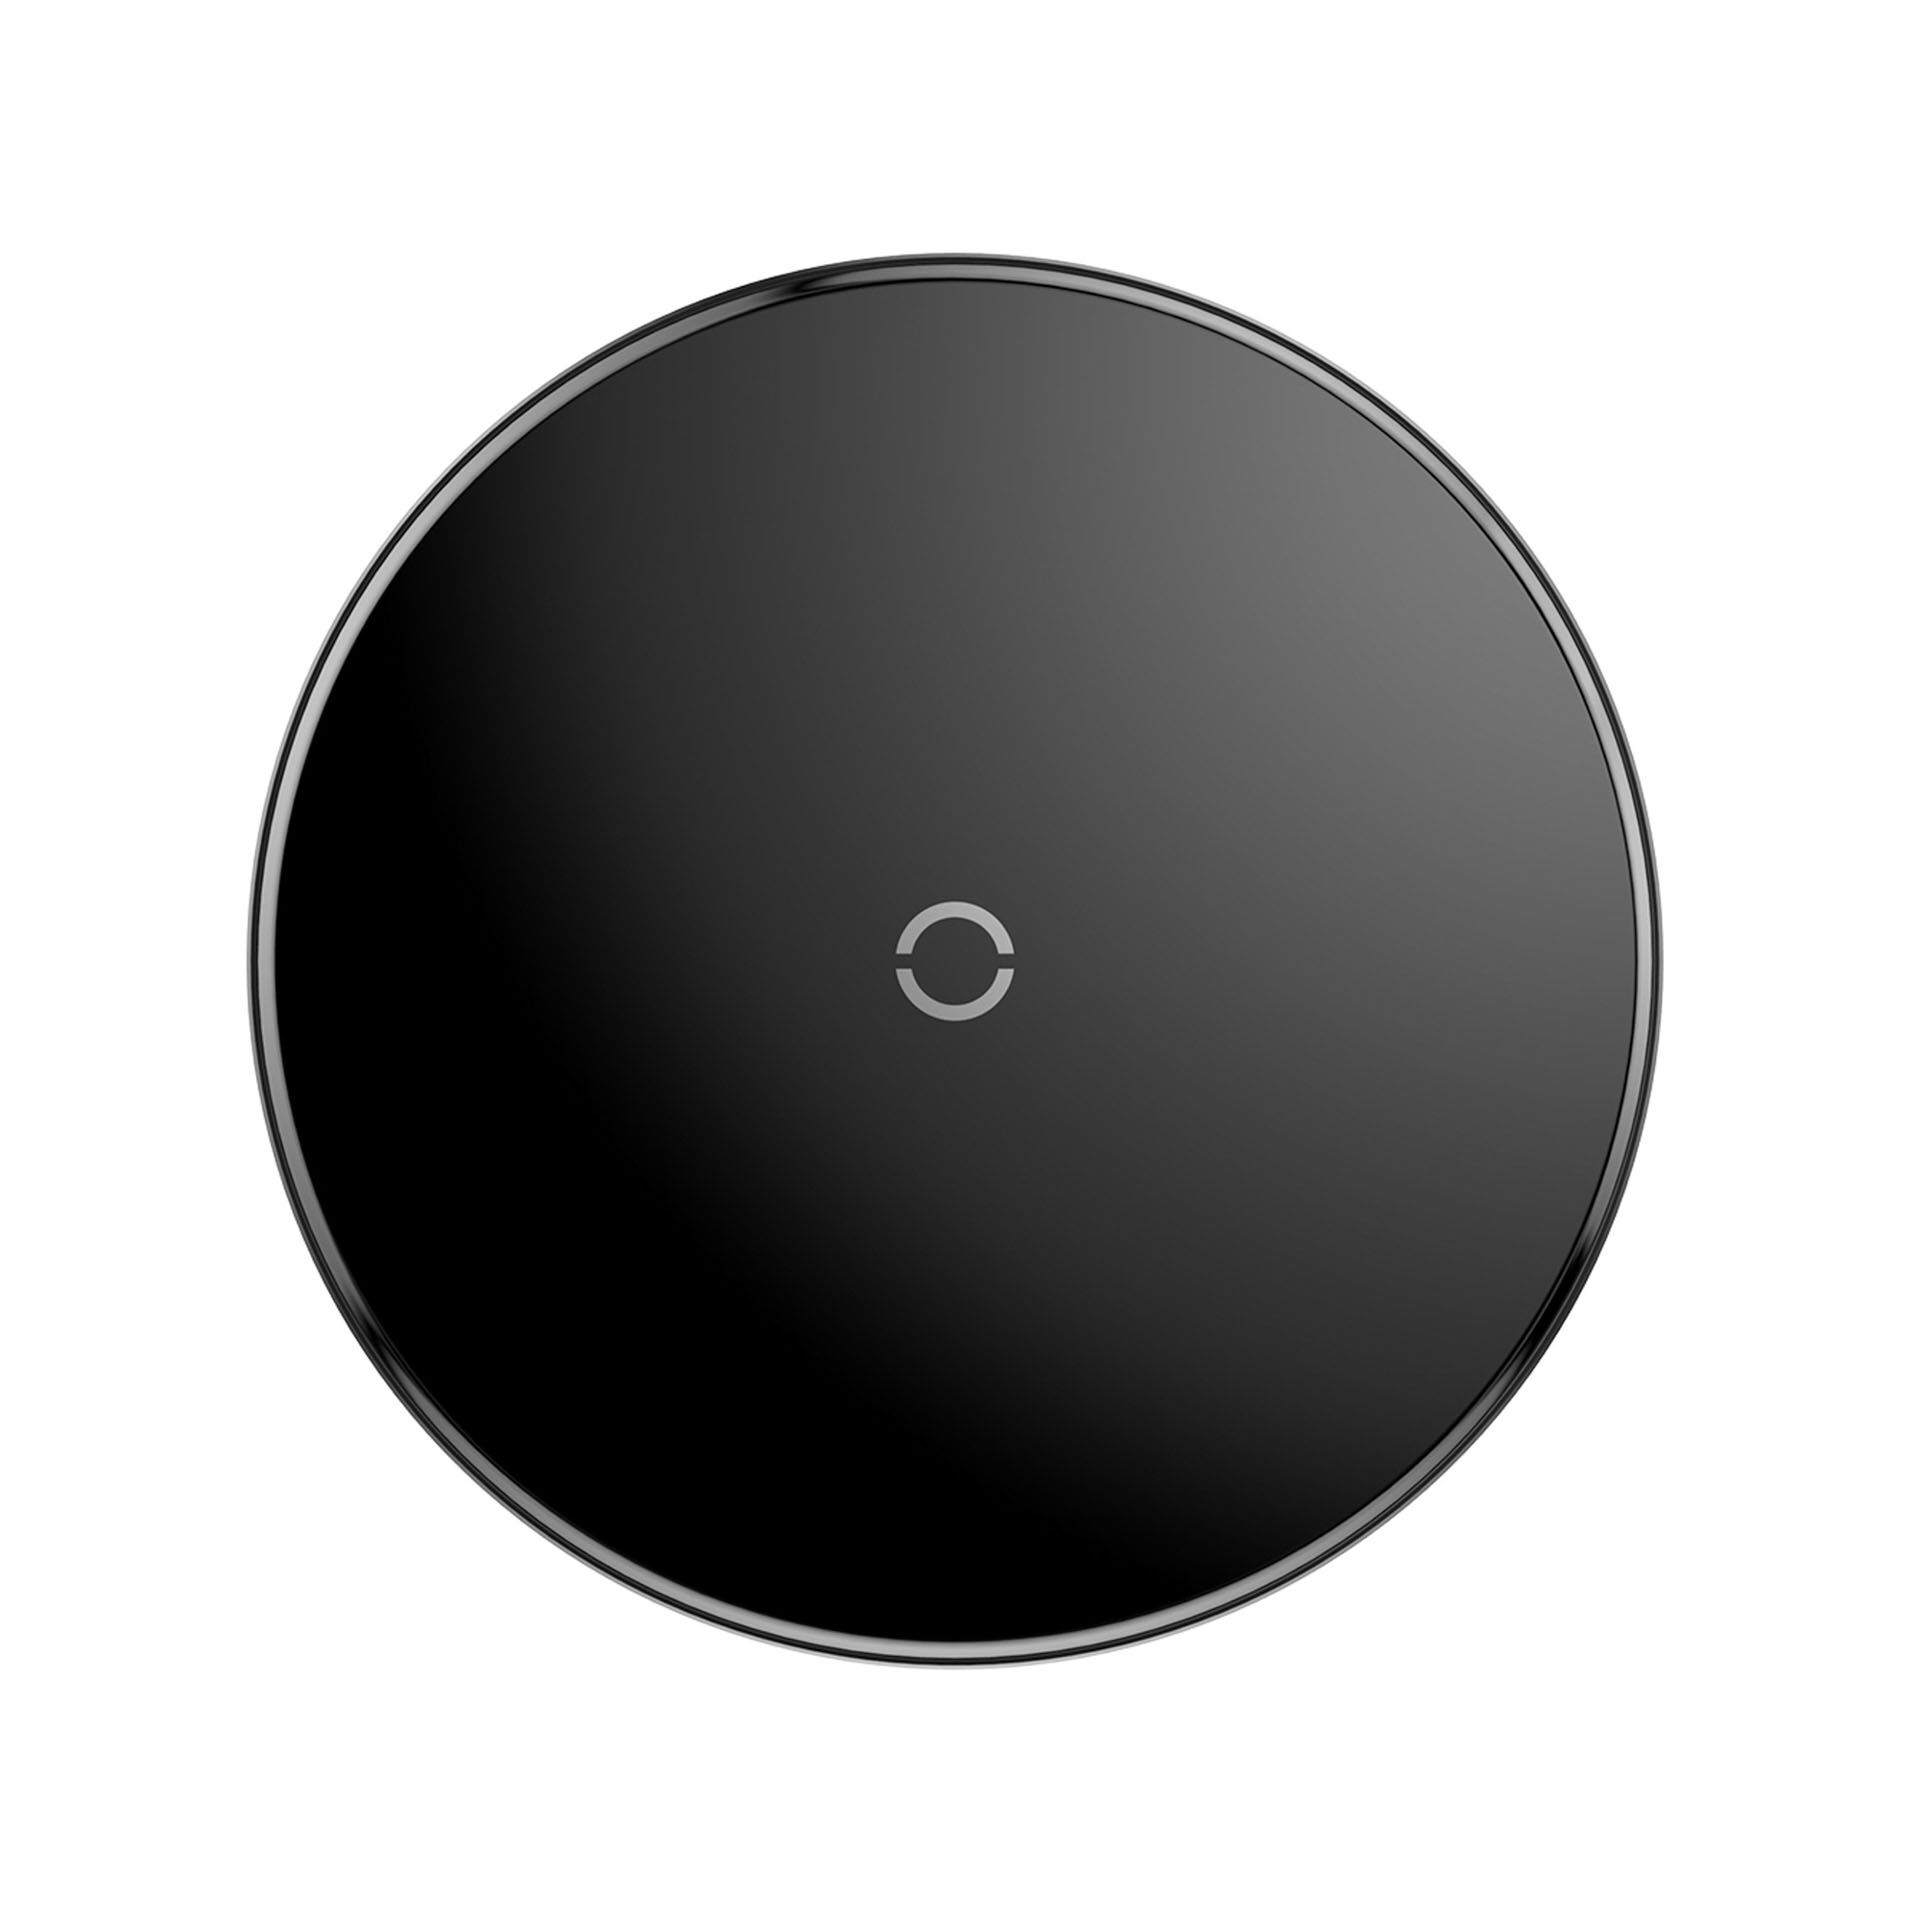 miniatura 18 - Caricabatterie wireless ultra sottile per smartphone